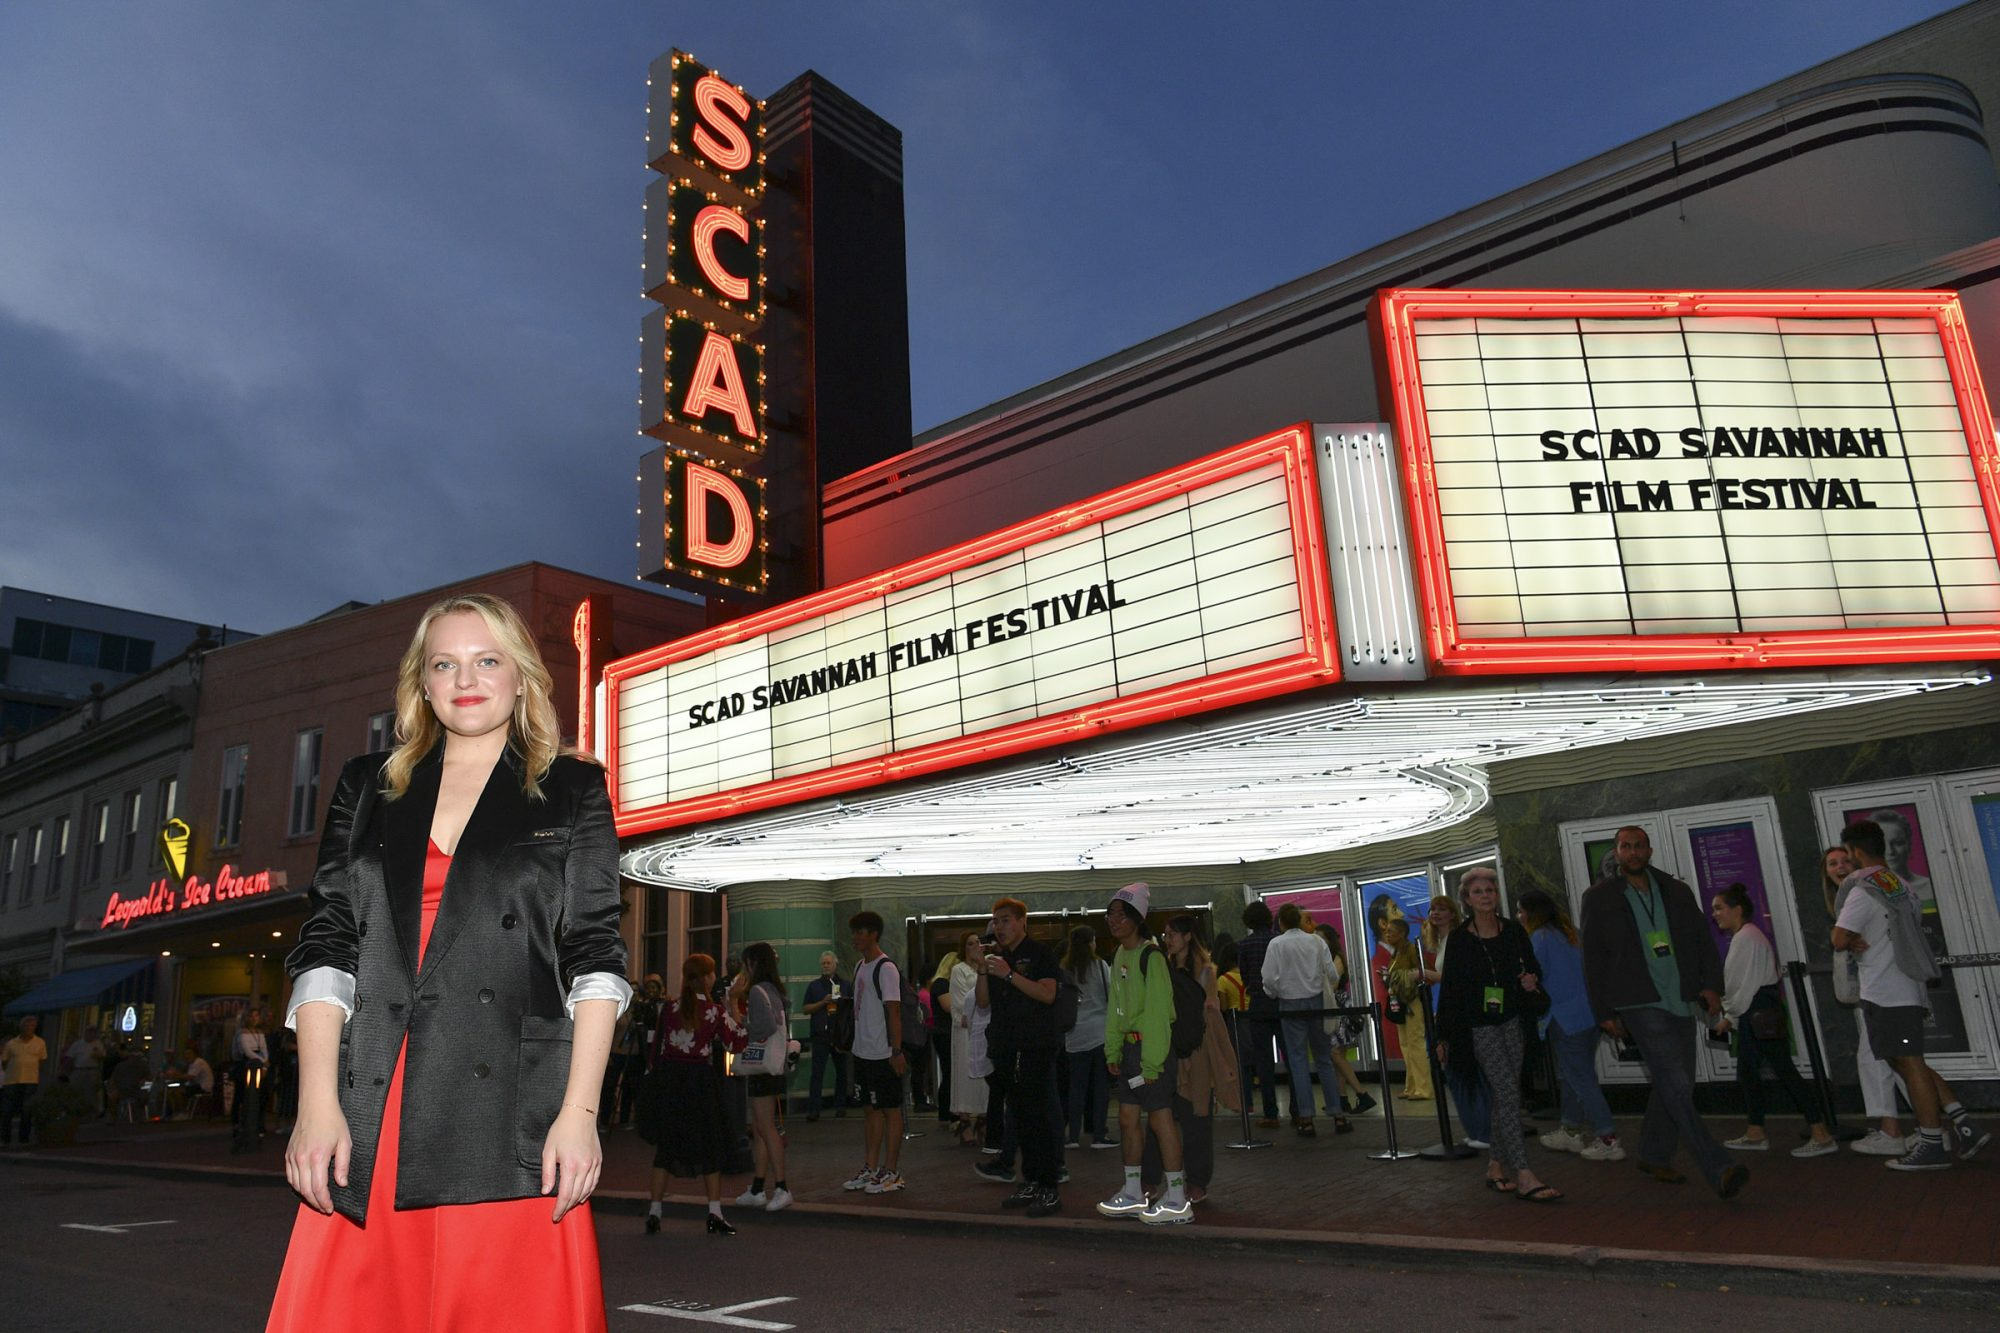 22nd SCAD Savannah Film Festival – Red Carpet - Day 6